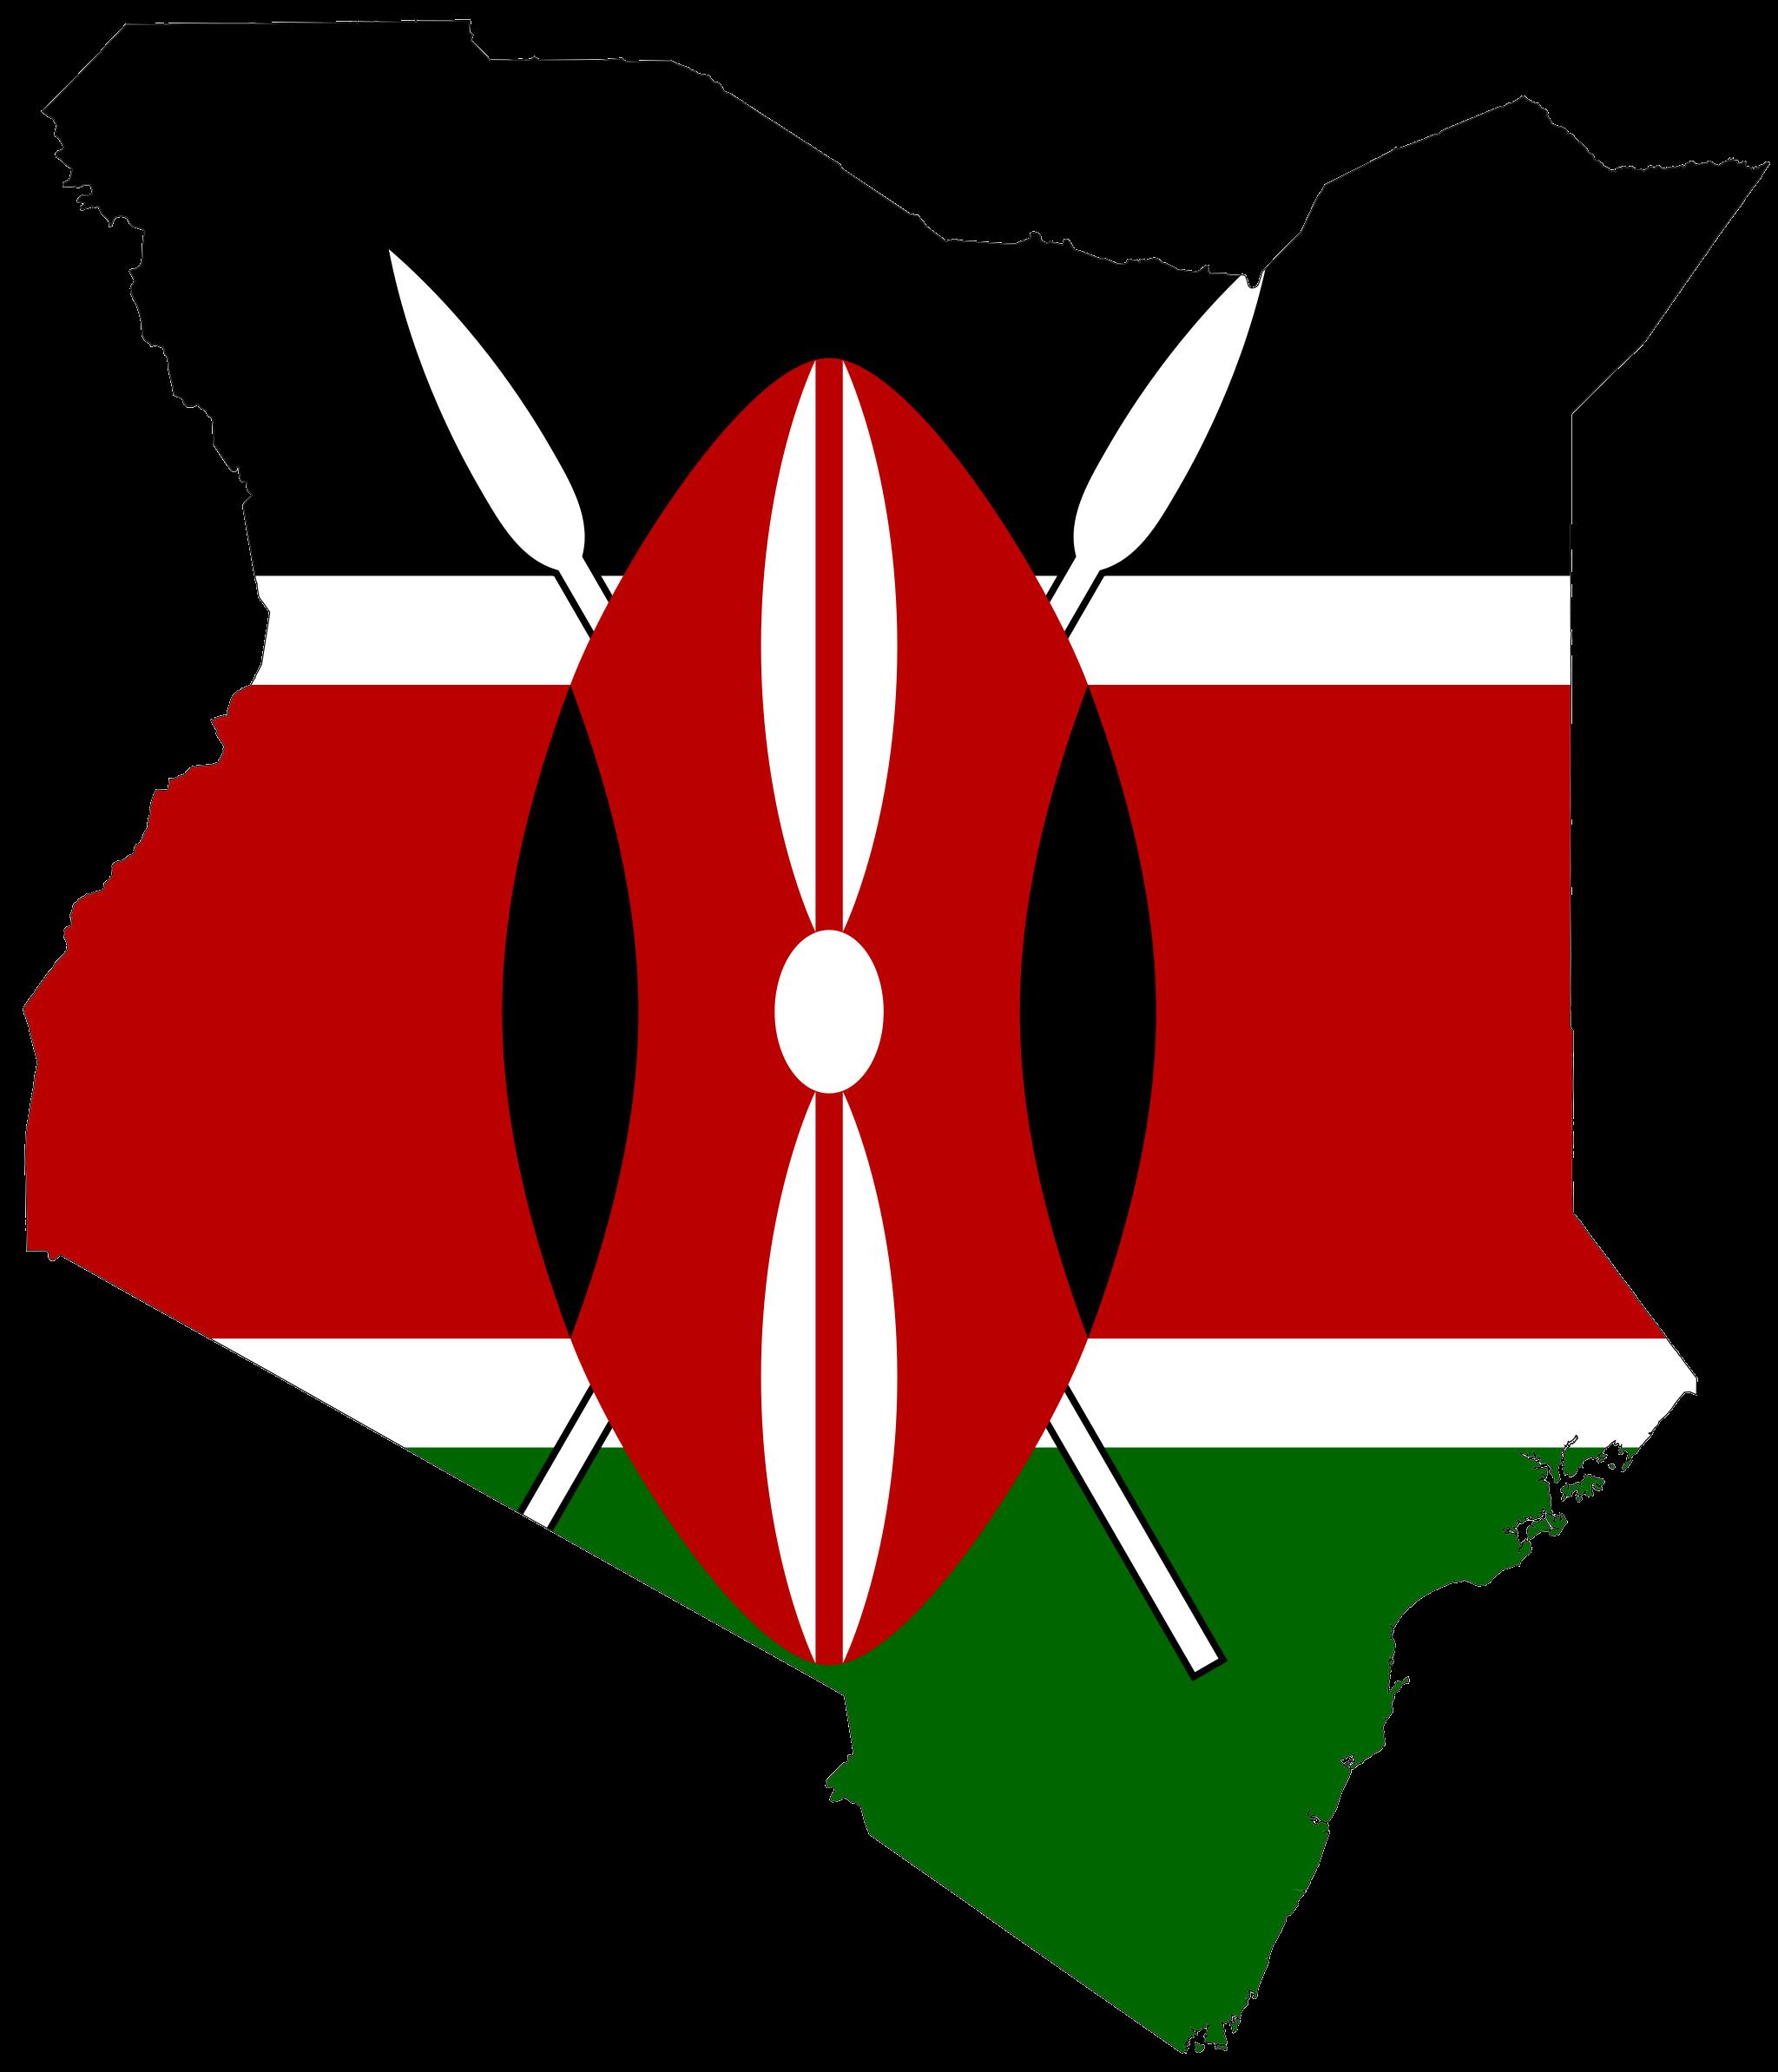 Crime clipart capture the flag. Kenya june trekmedics org